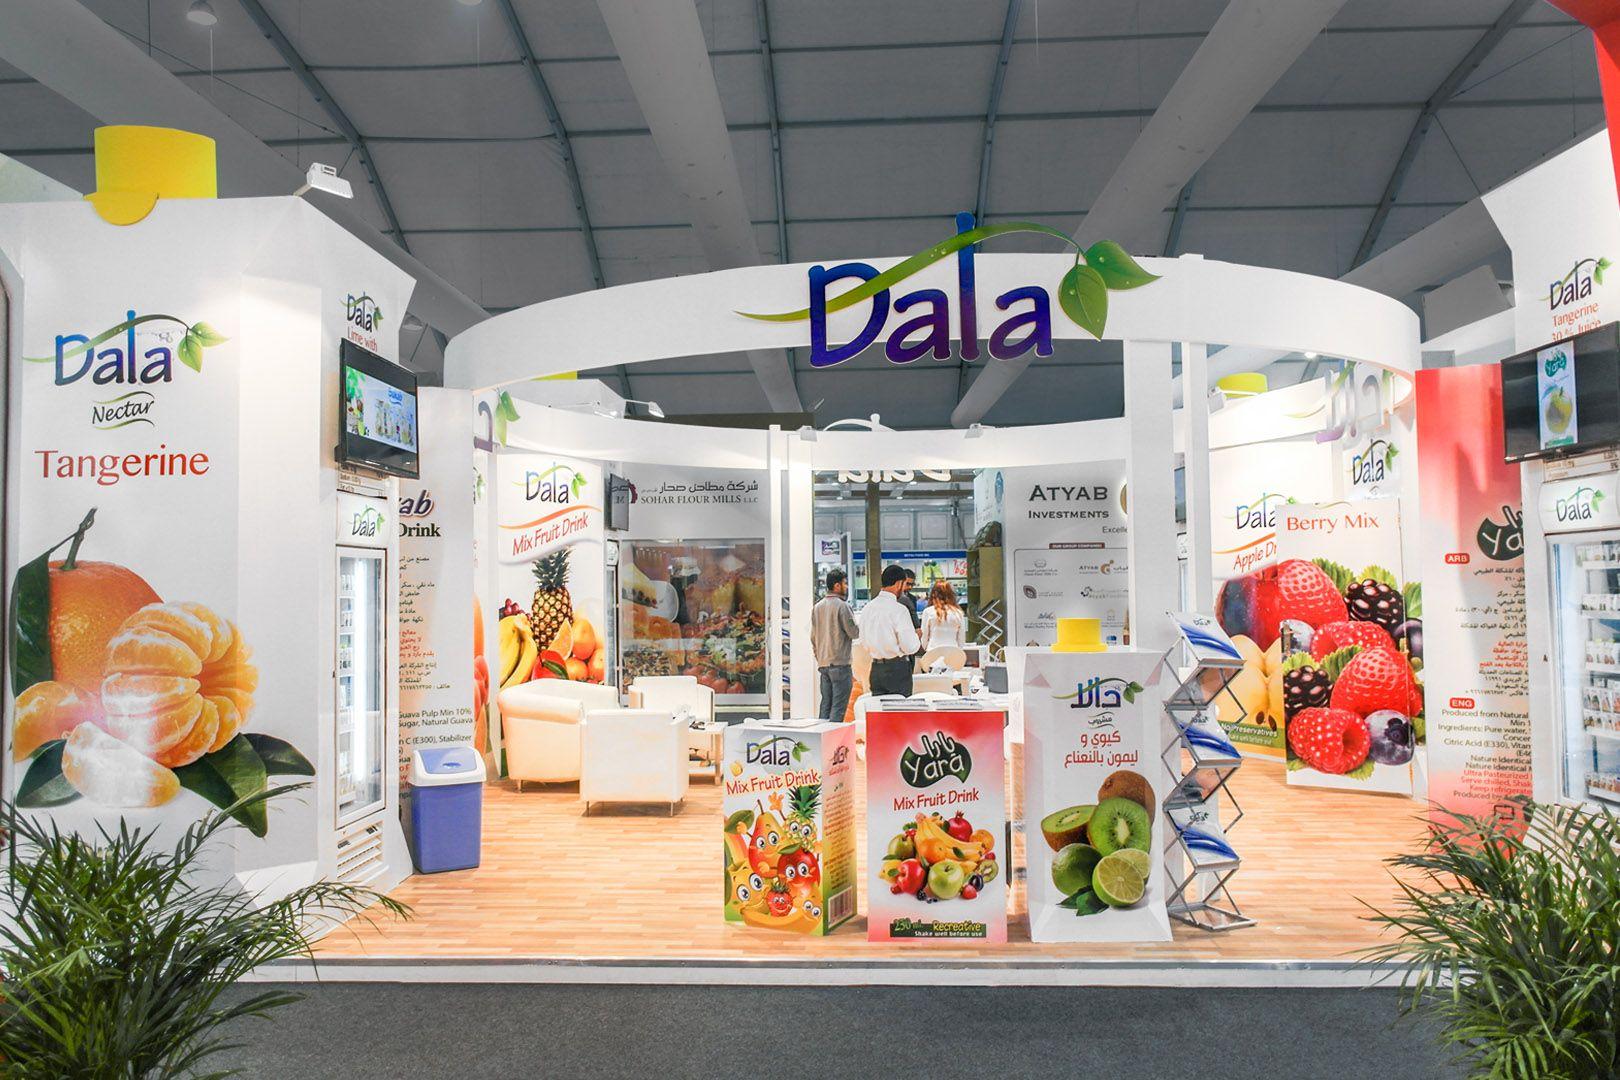 DALA  #foodtradefair #worldfood #foodexpo #dala #standdesign #exhibitionstand #exhibitionbooth #customstand #customstands #custommadestand #tailoredstand